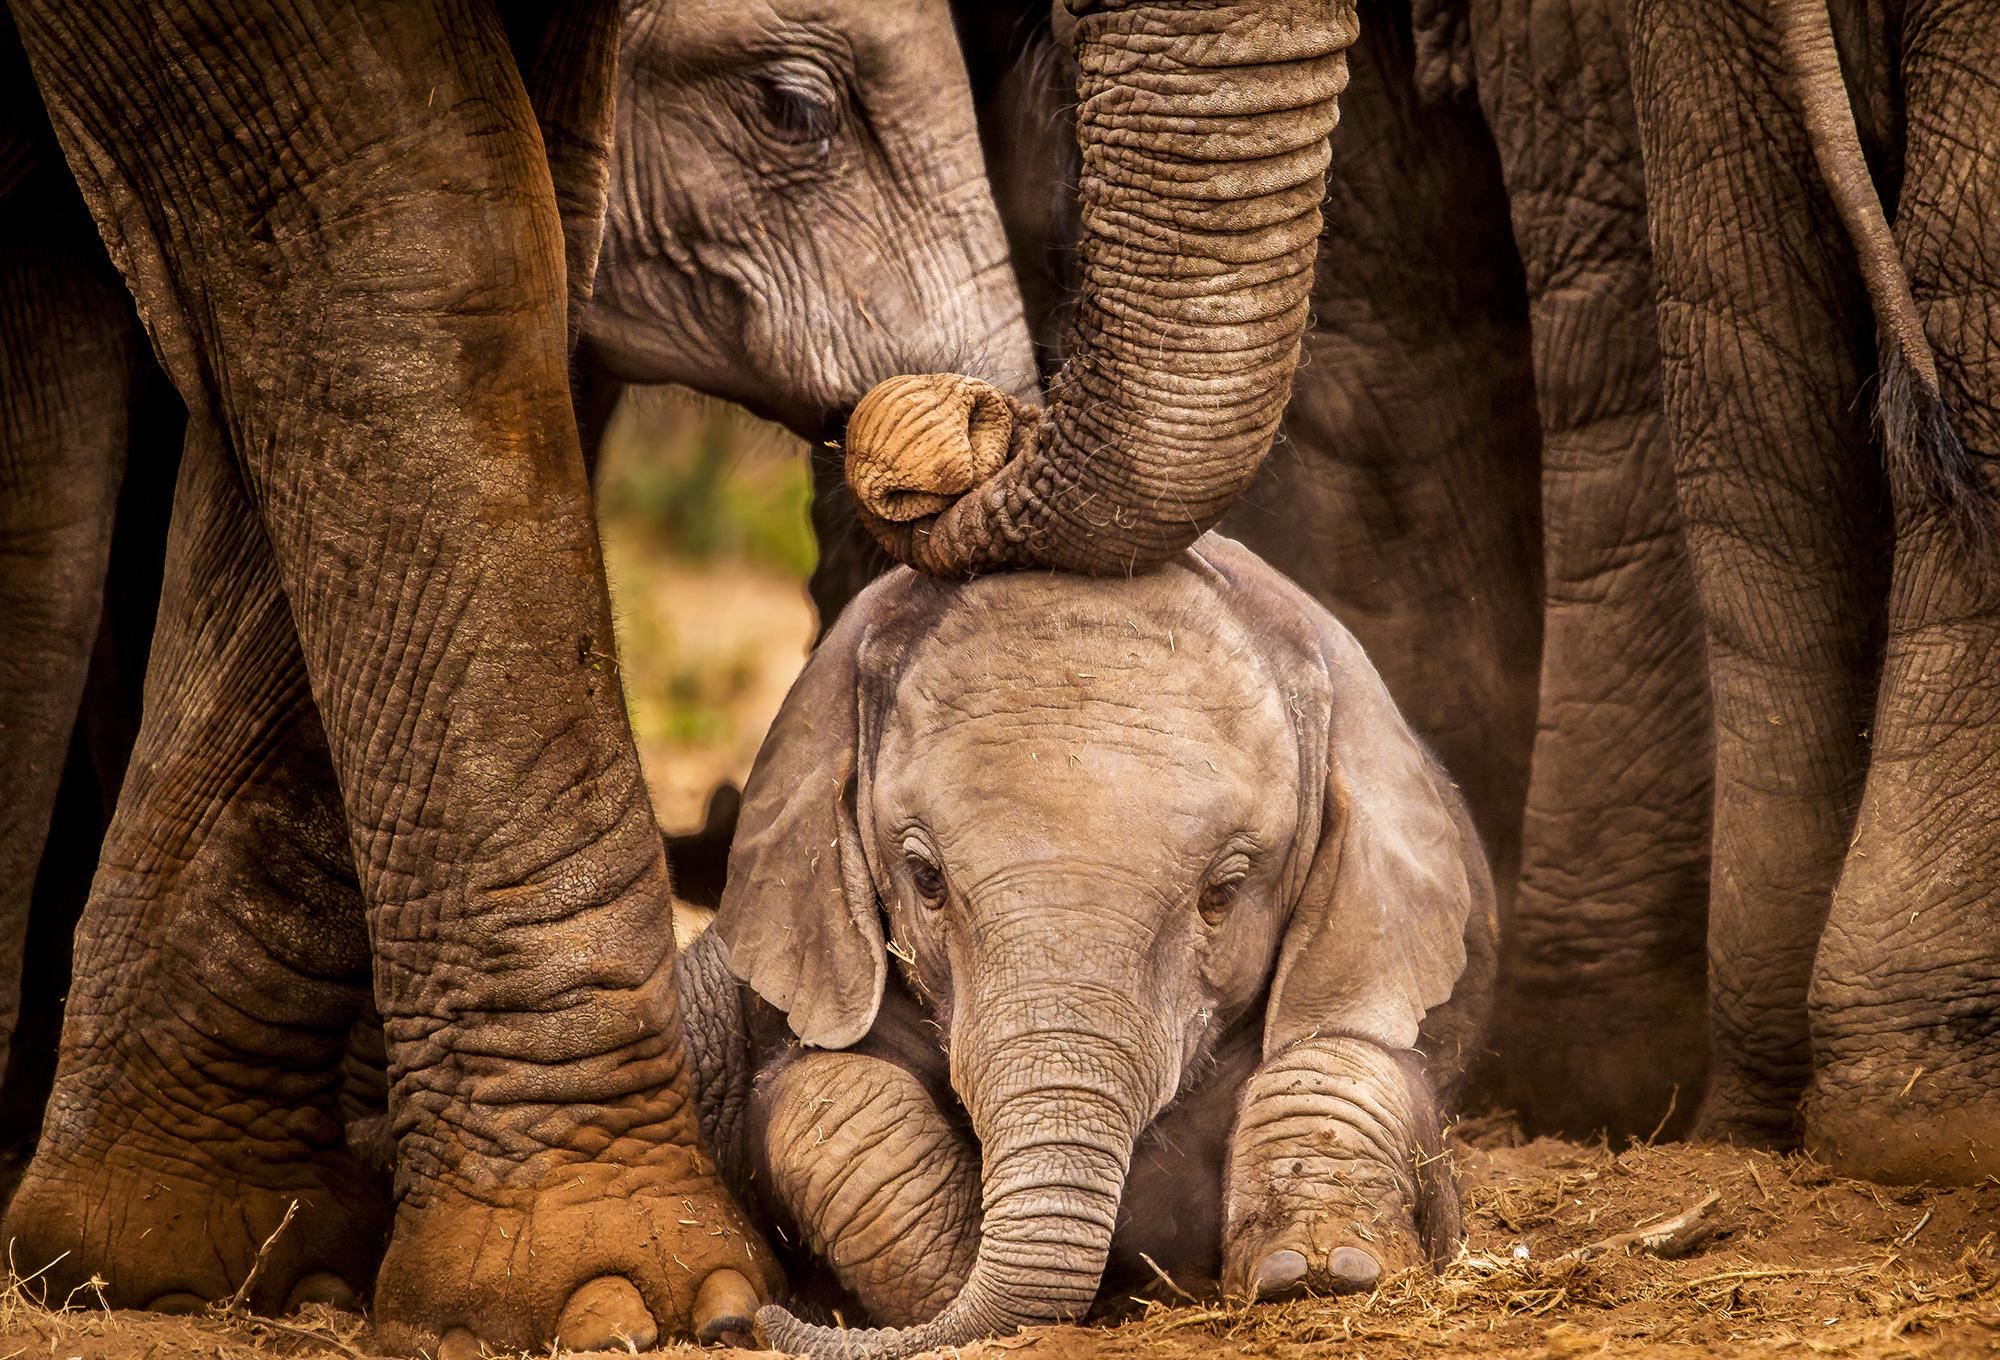 Fakta_210812_Elefant_unge